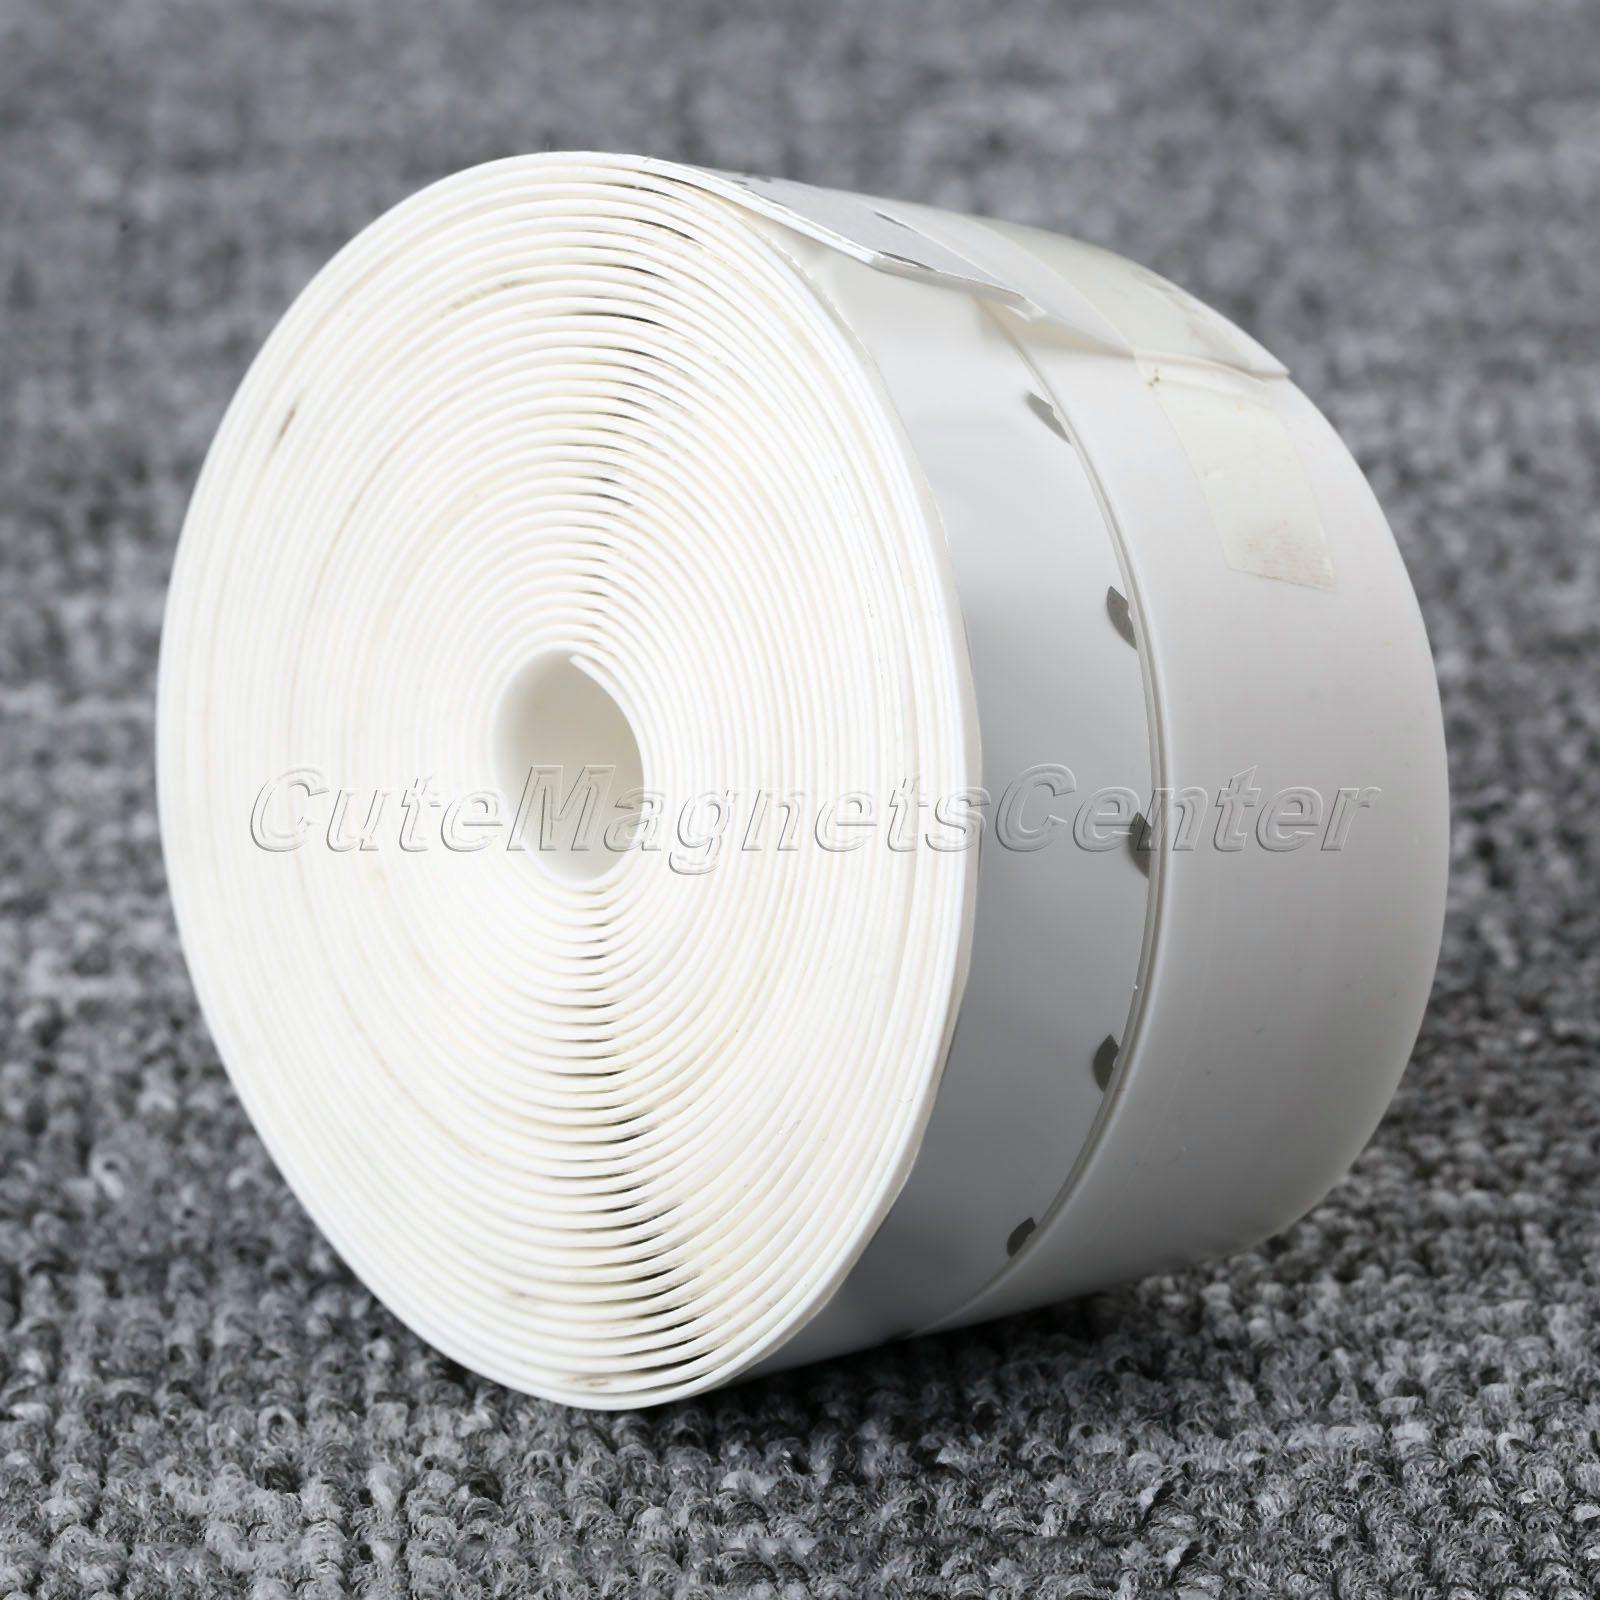 mtsooning 5M Glue Door Window Draught Dust Insect Seal Strip Soundproofing Weatherstrip 45mm Width White Door Accessories